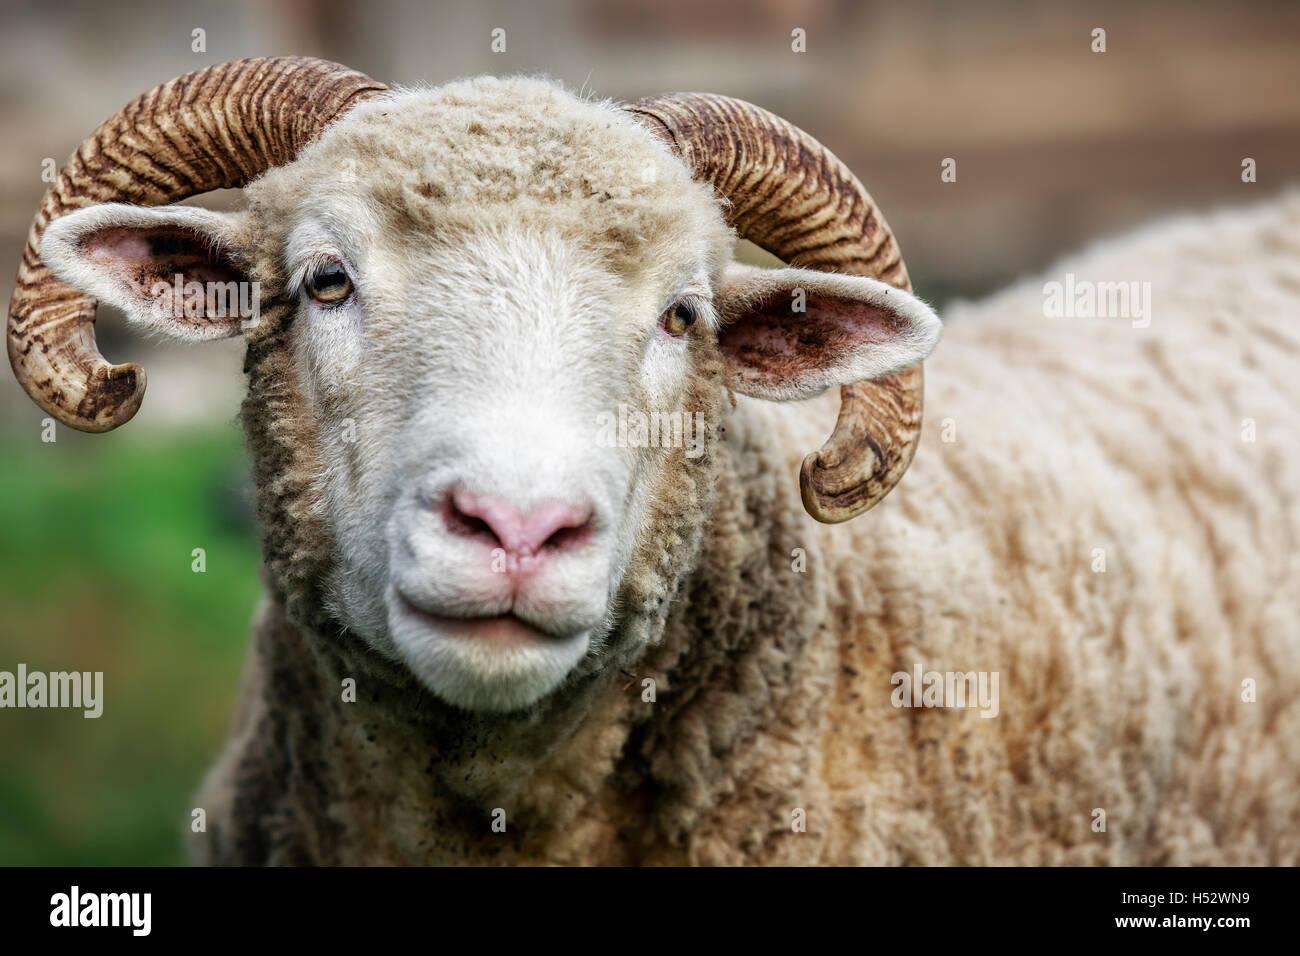 Shetland Sheep, close up - Stock Image